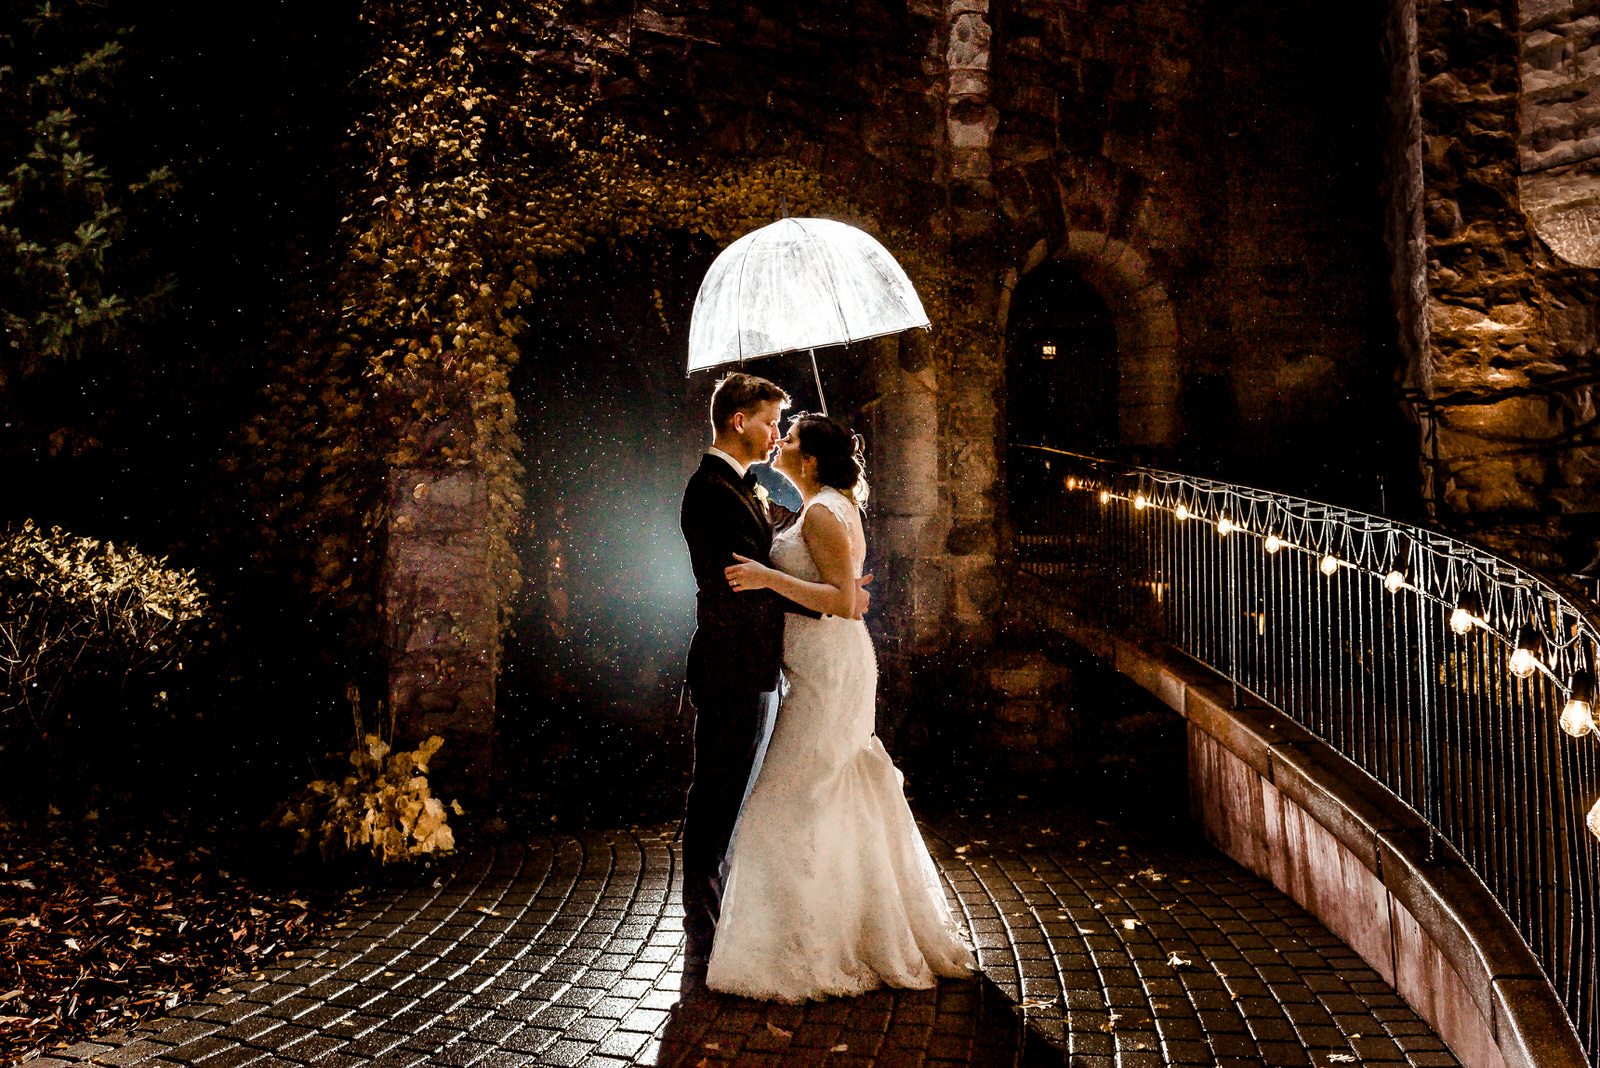 Romantic Wedding Photographer in Minneapolis - Van Dusen Mansion Wedding in the Rain